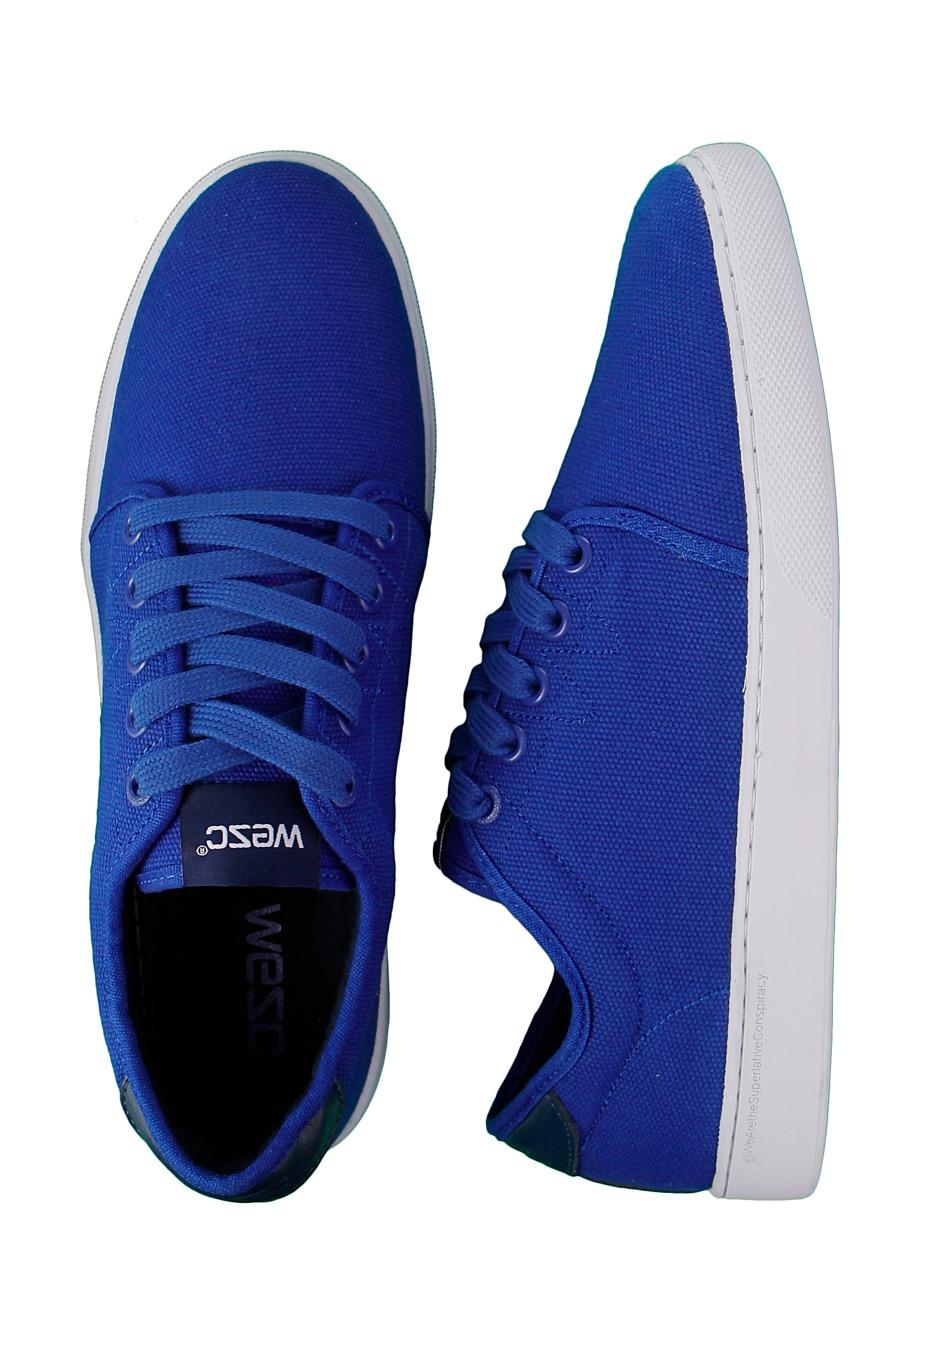 blue shoes wesc - edmond royal blue - shoes - impericon.com worldwide NQQOJUI